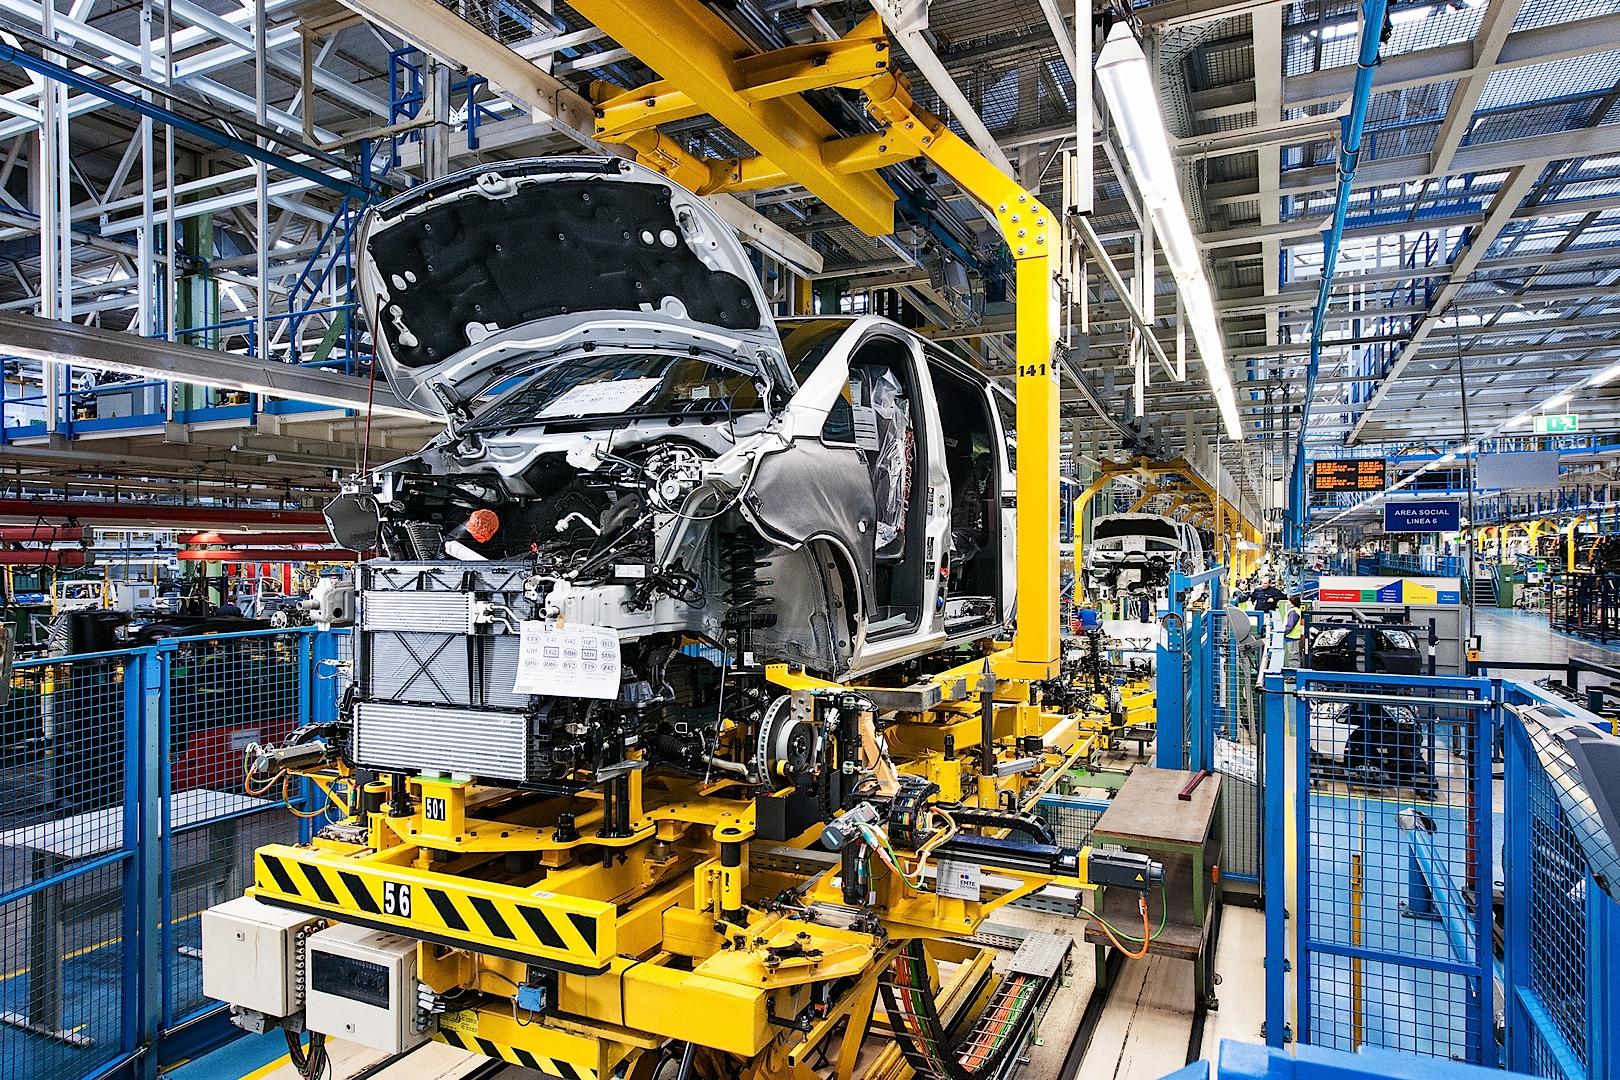 Nissan 370z Nismo Interior New Mercedes-Benz V-Cl...